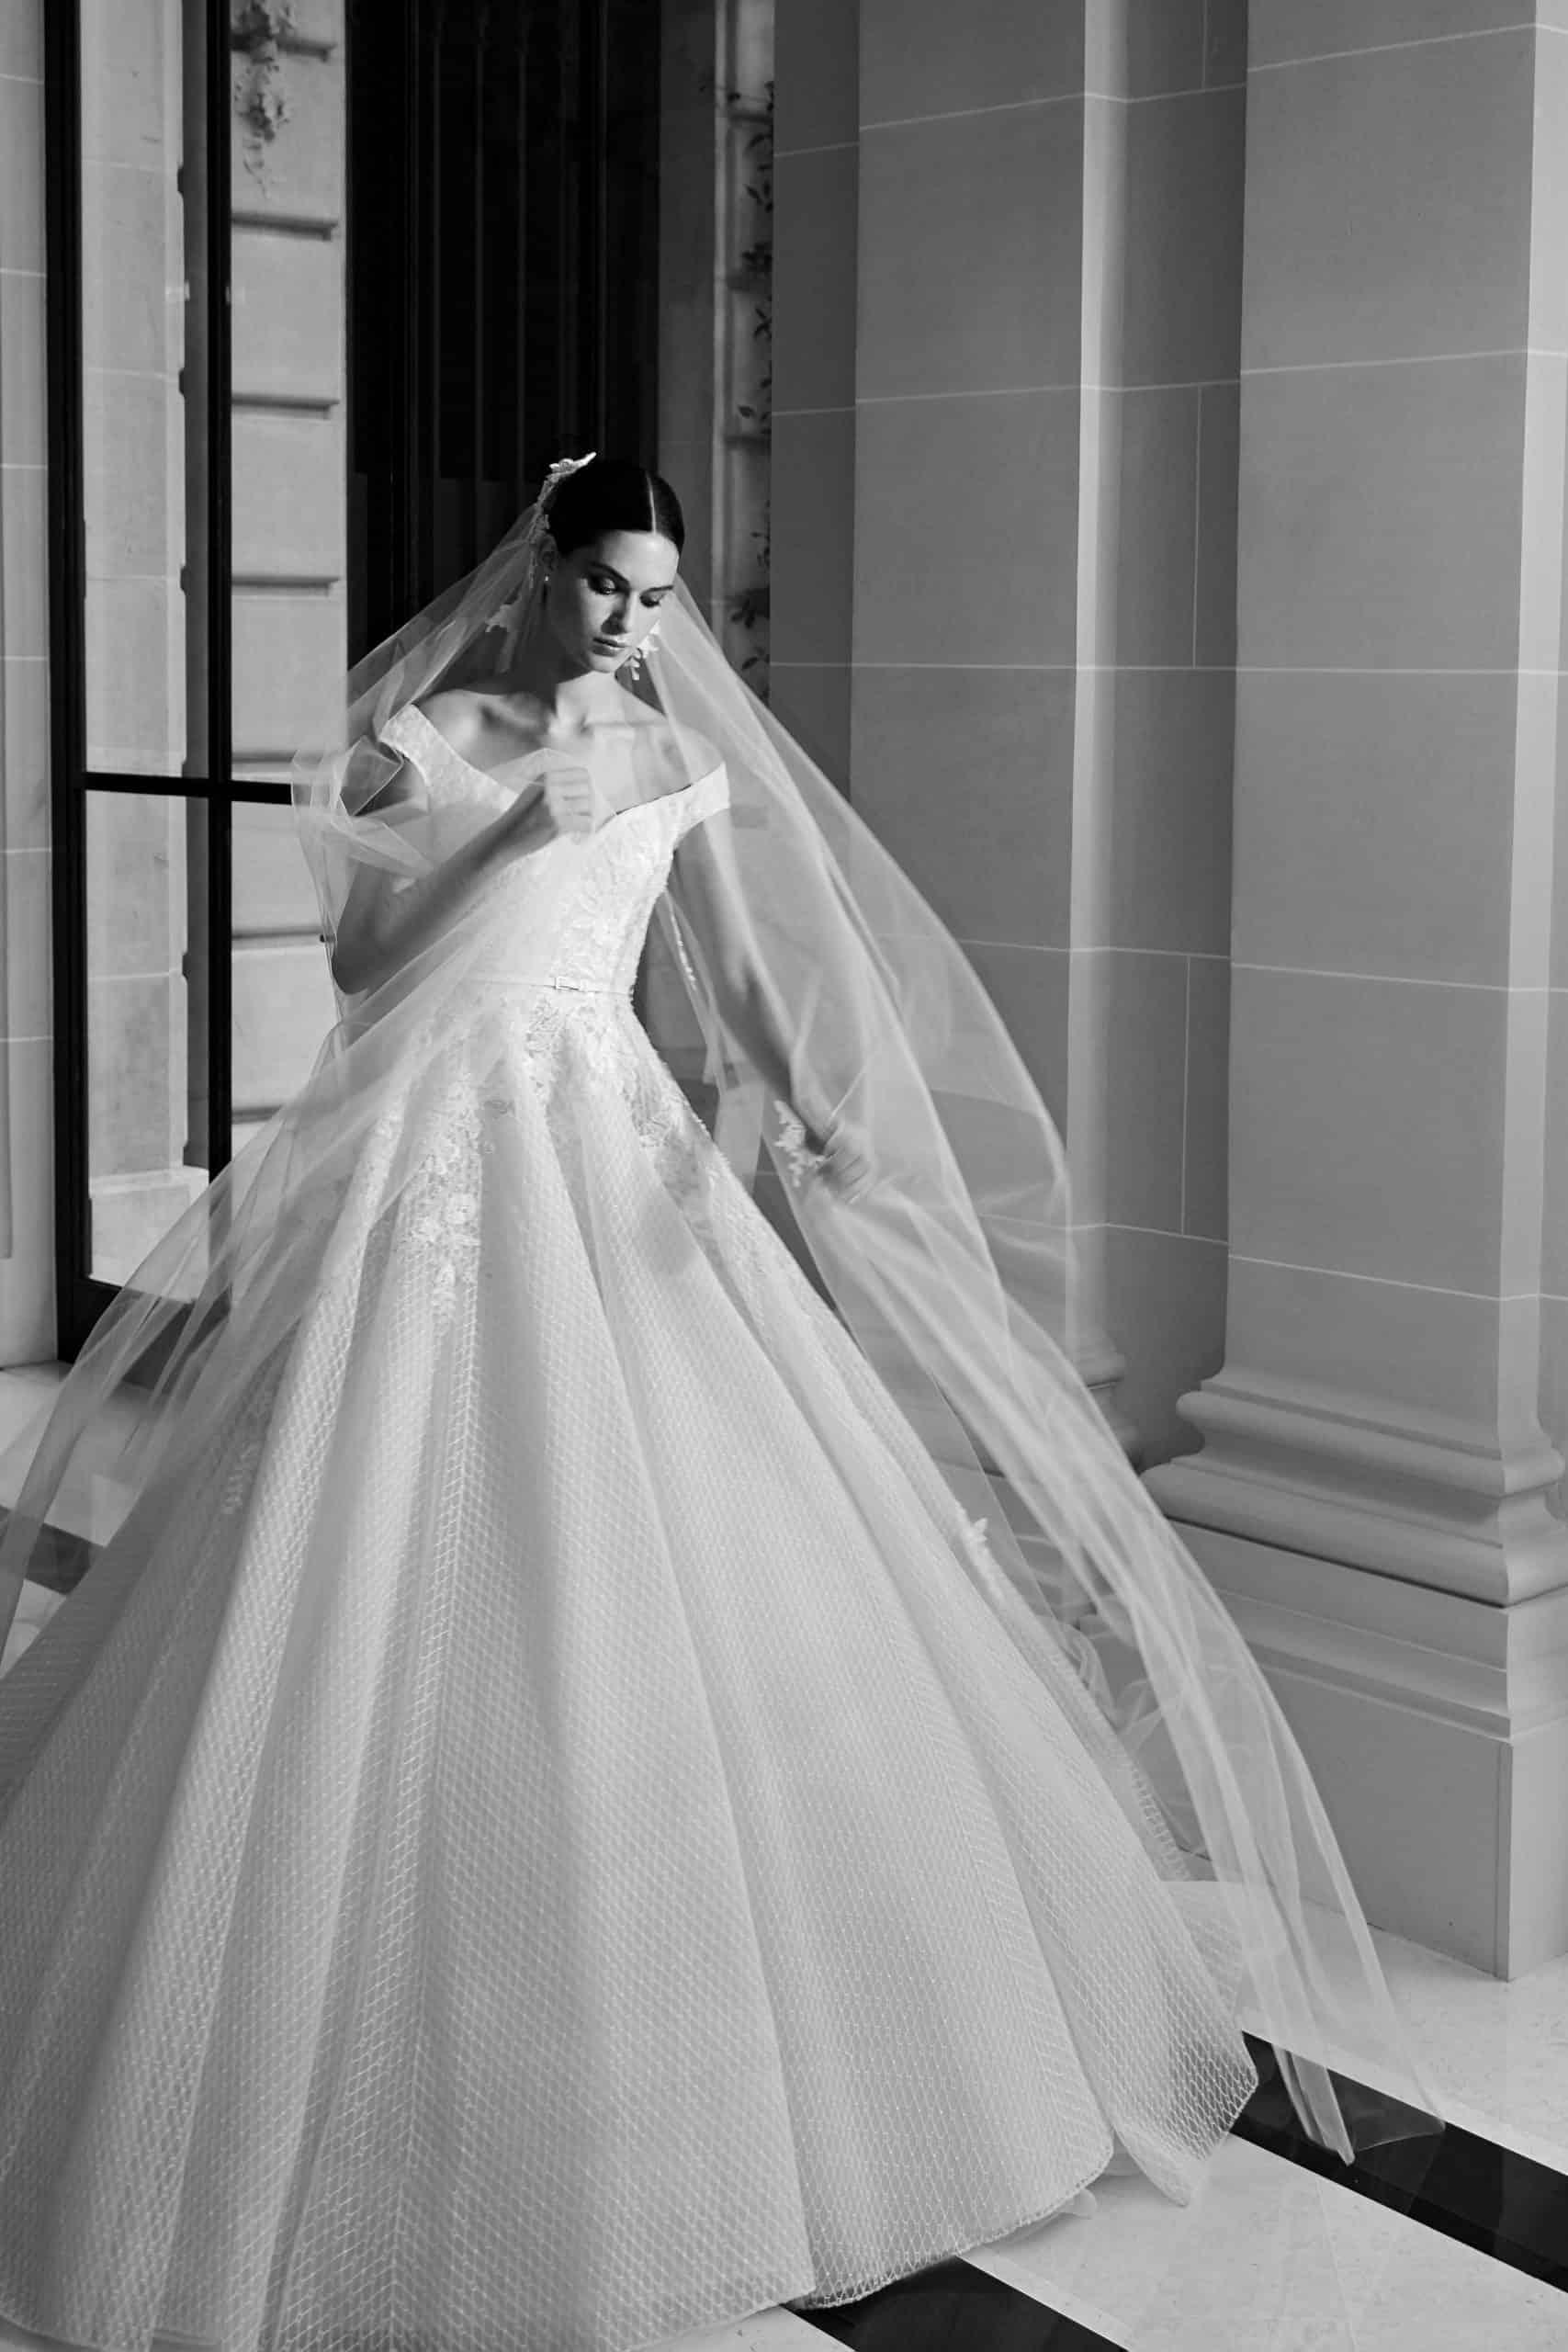 princess wedding dress by Elie Saab